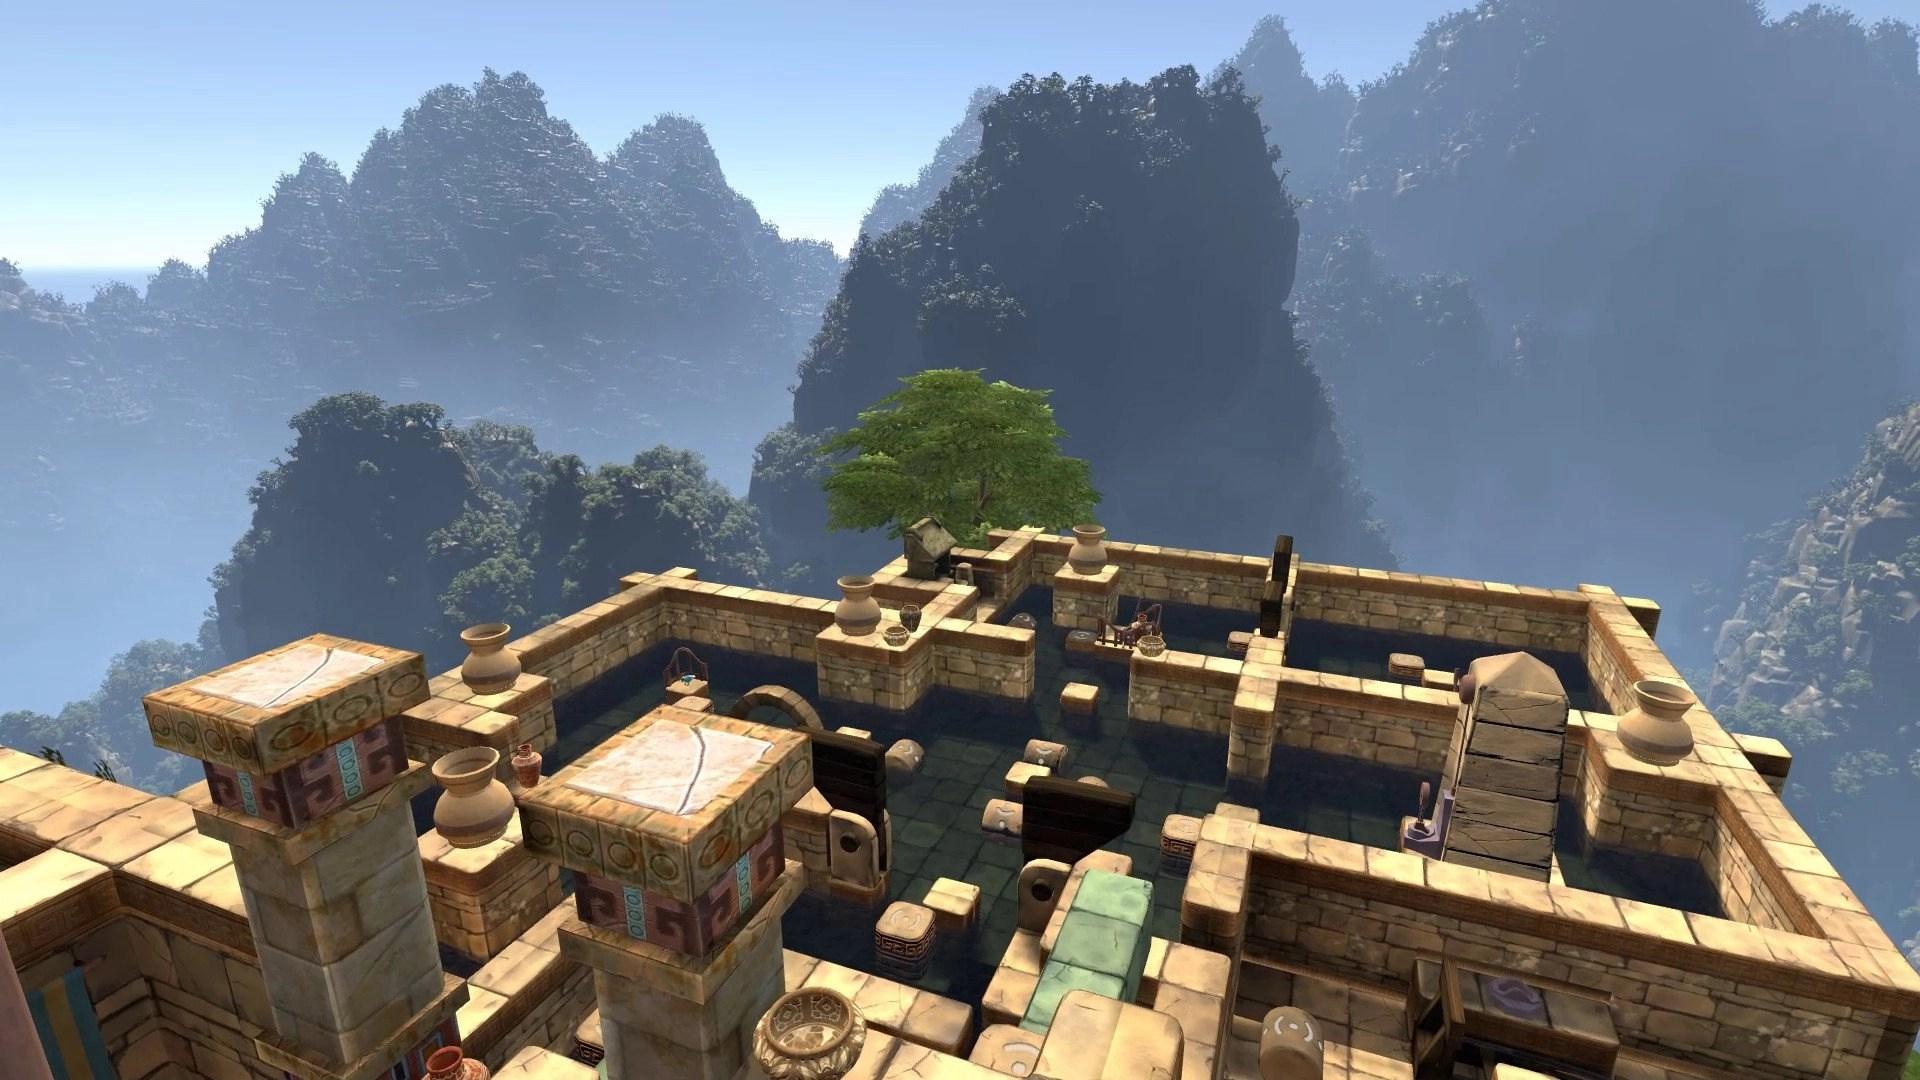 beste Puzzle-VR-Spiele